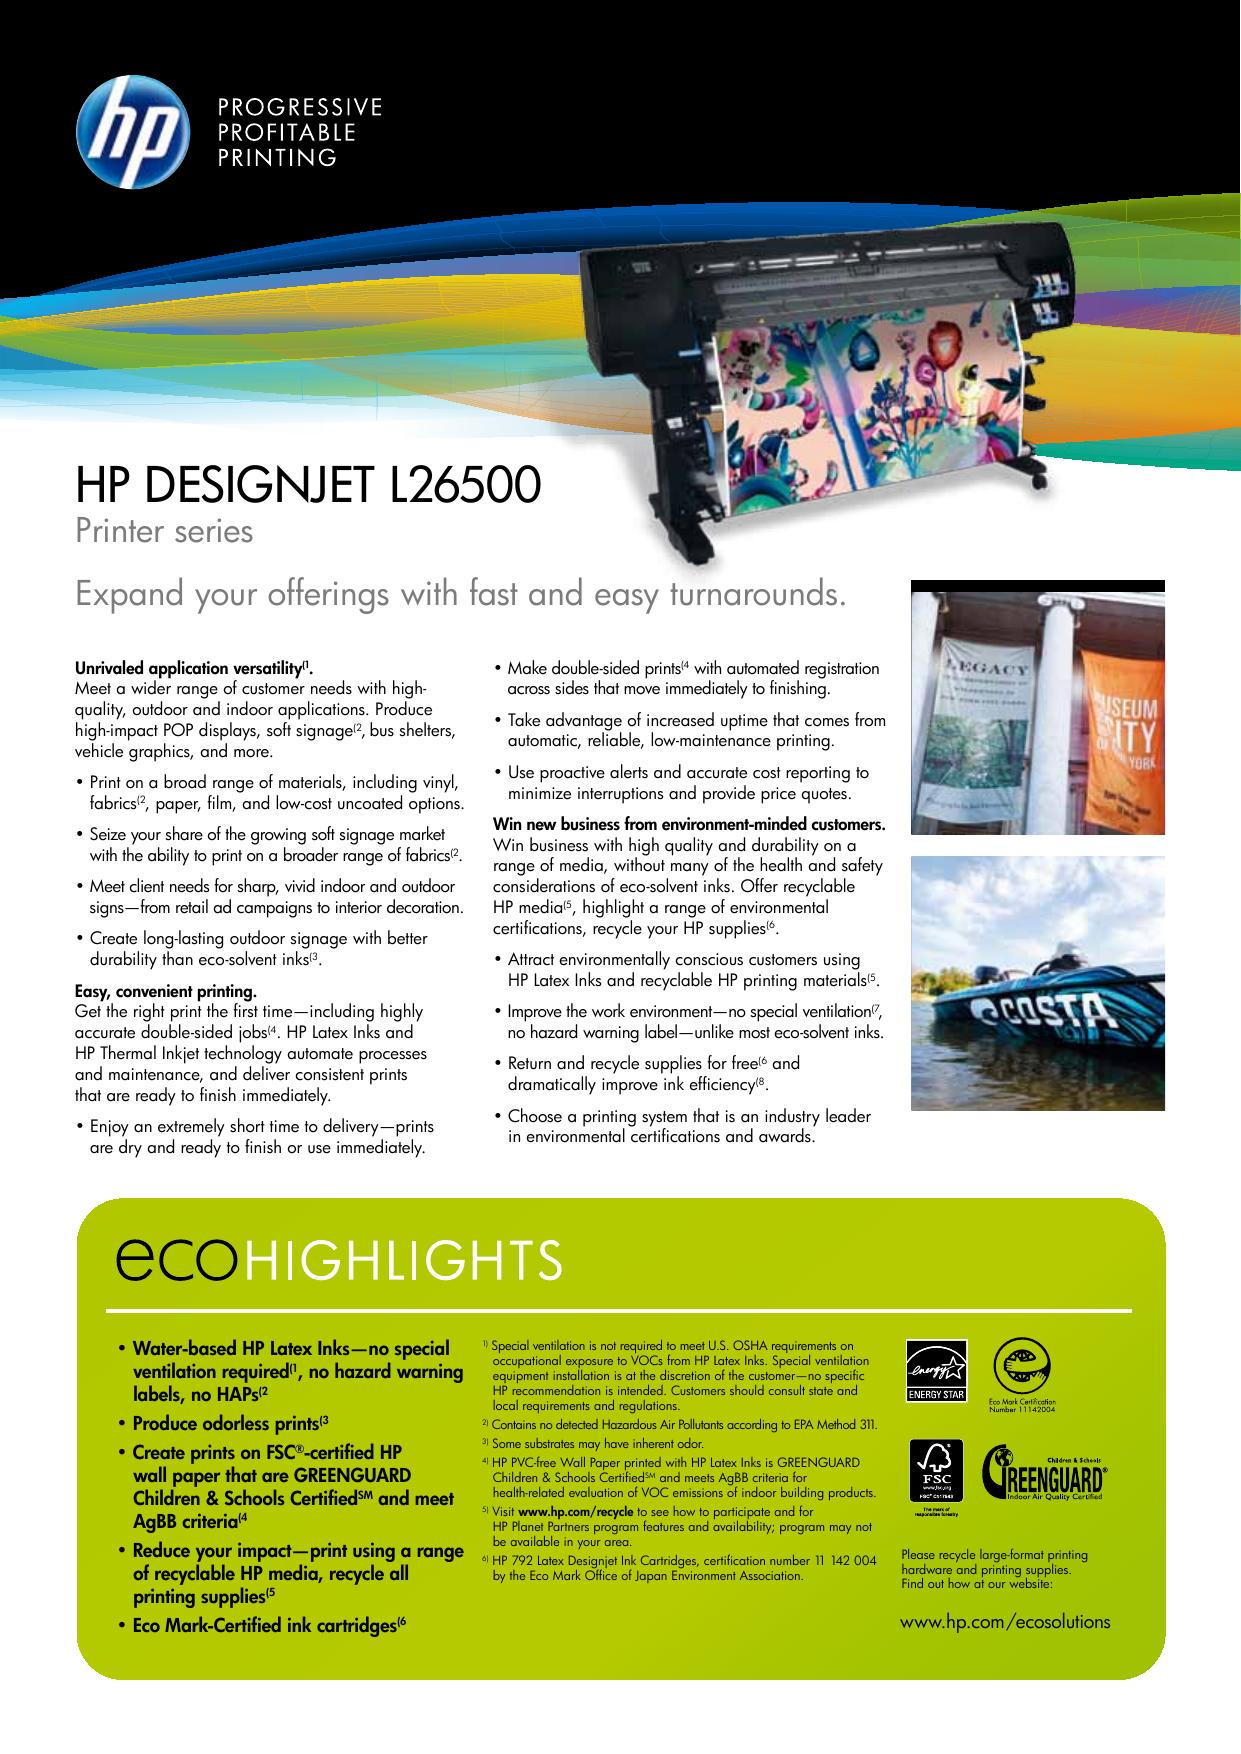 Hp Designjet L26500 Users Manual 81 Yellow Dye Printhead And Cleaner Original